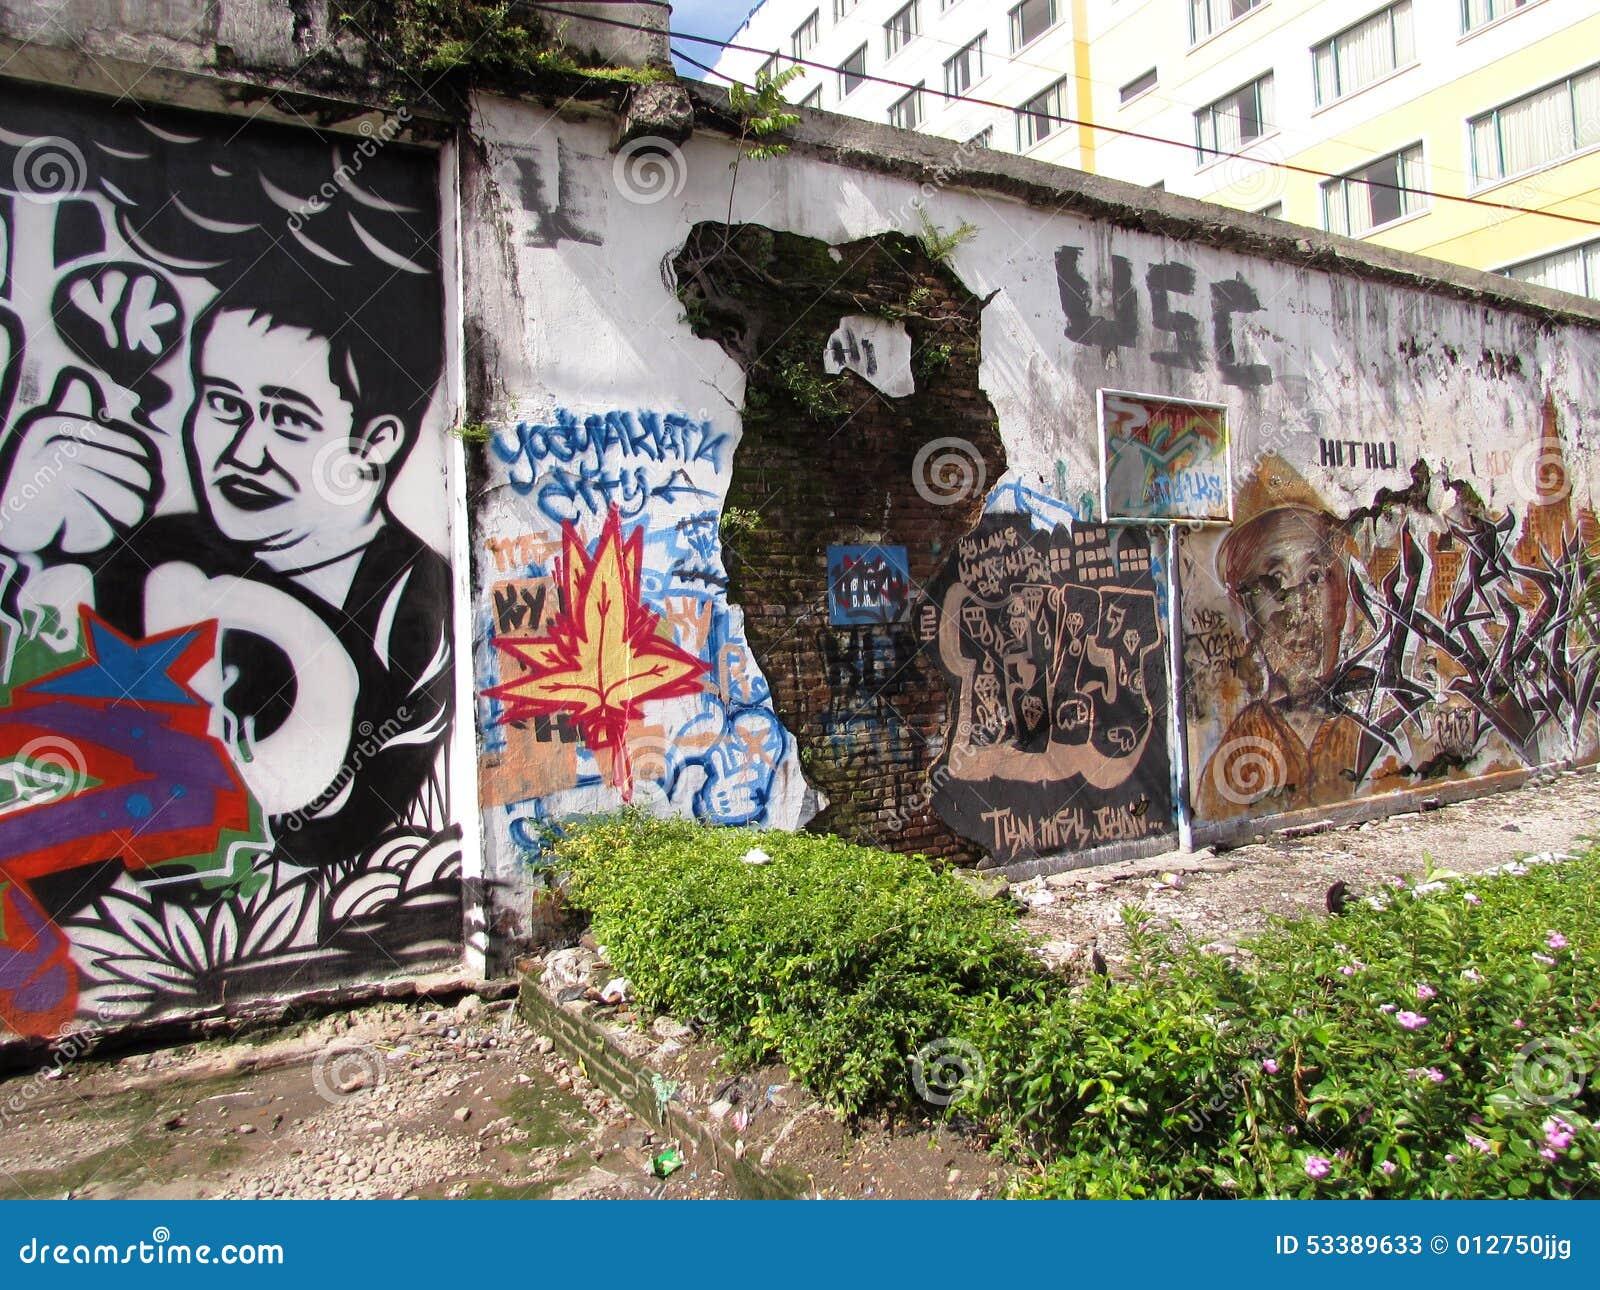 Yogyakarta wall art - Indonesia 2 & Yogyakarta Wall Art - Indonesia 2 Editorial Stock Photo - Image of ...